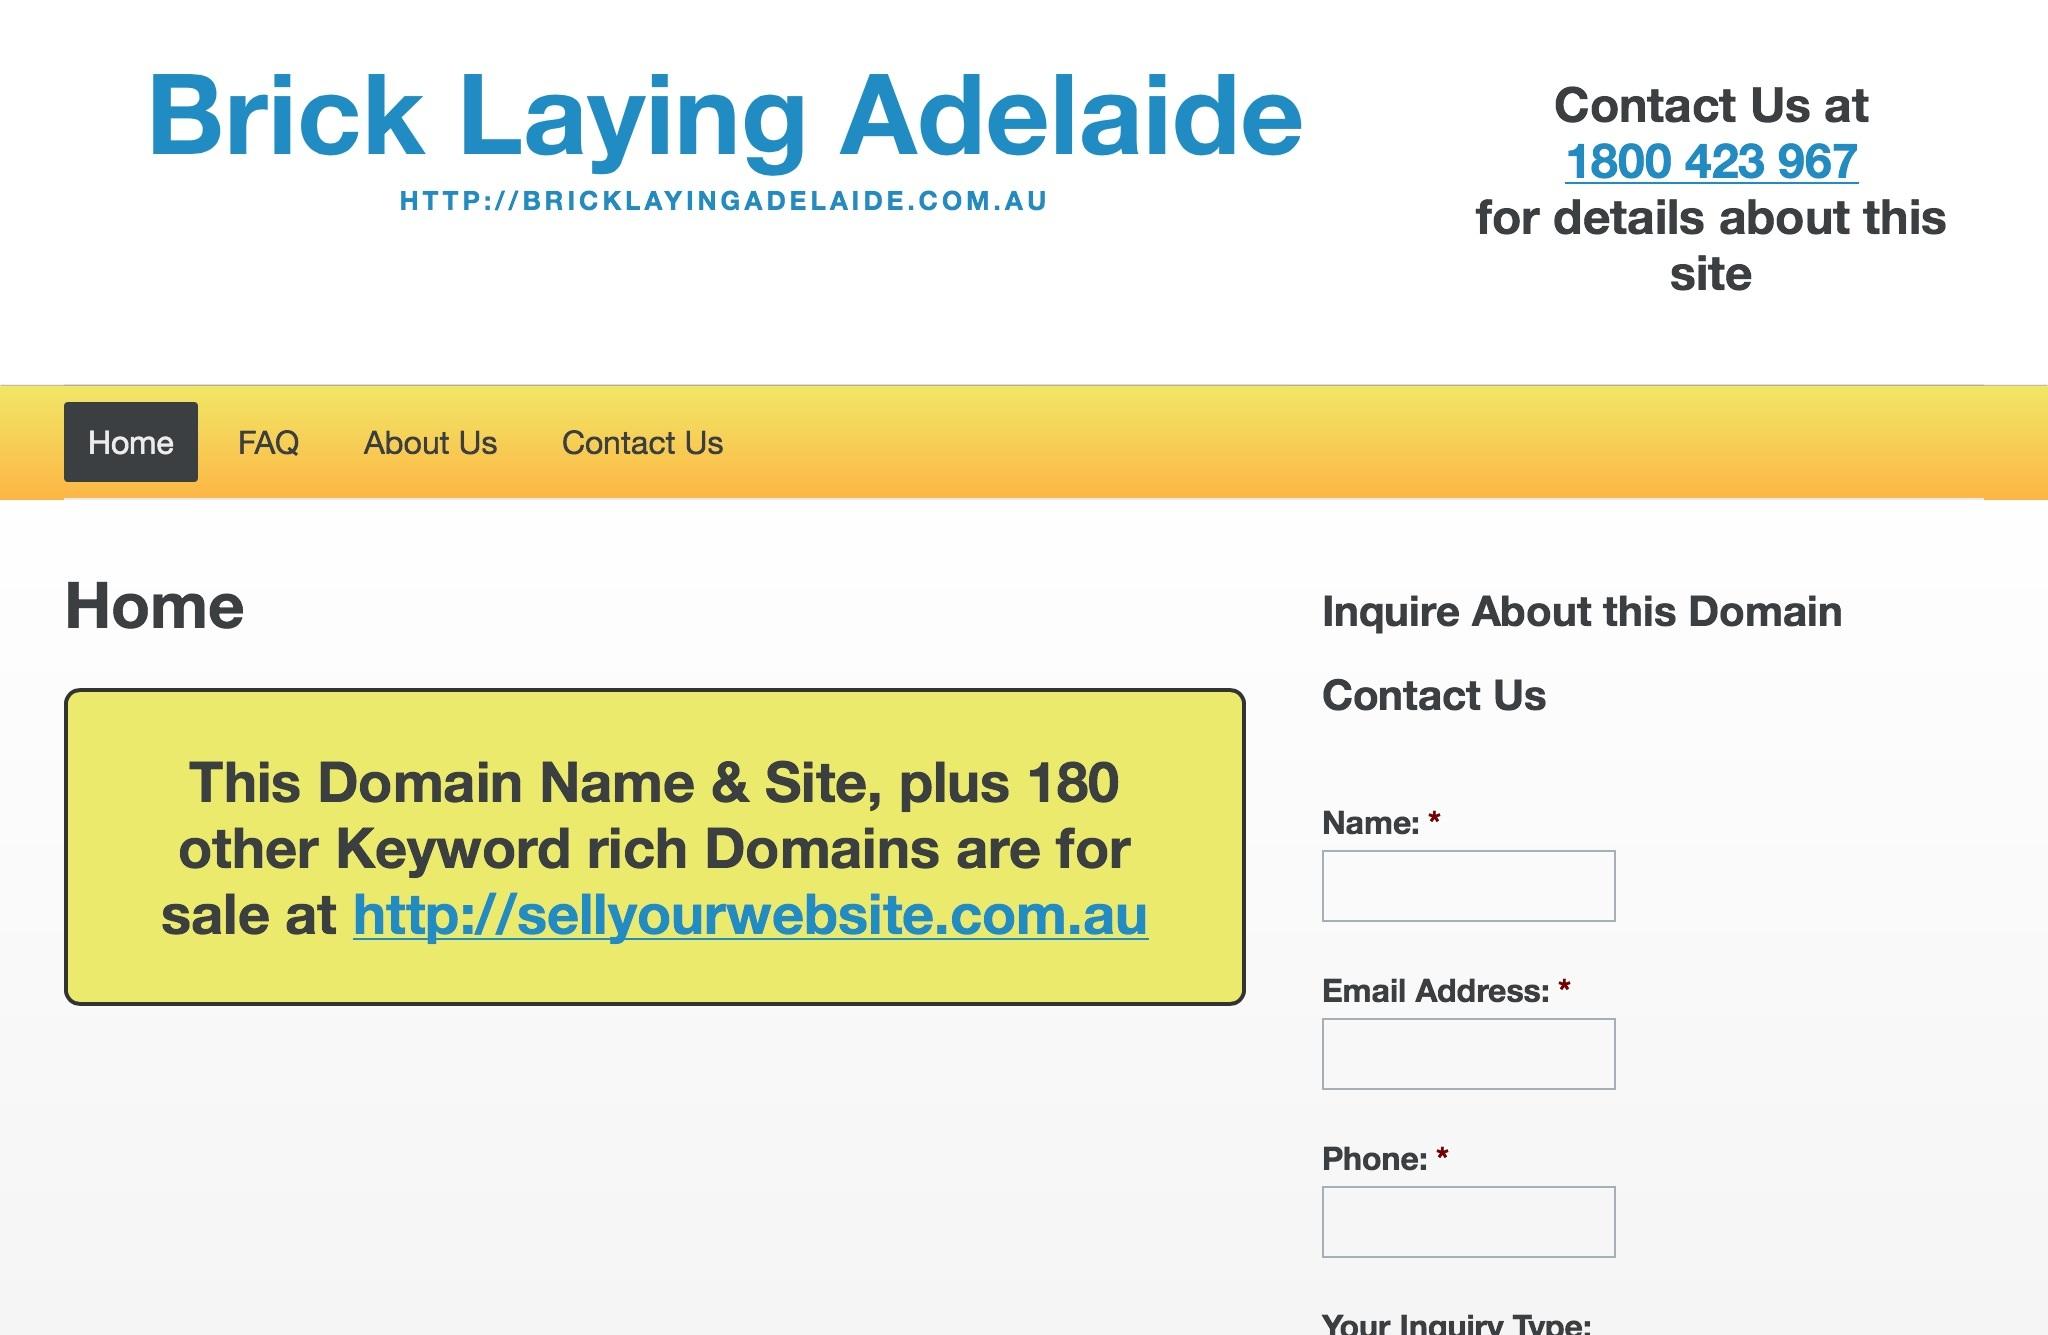 Brick Laying Adelaide